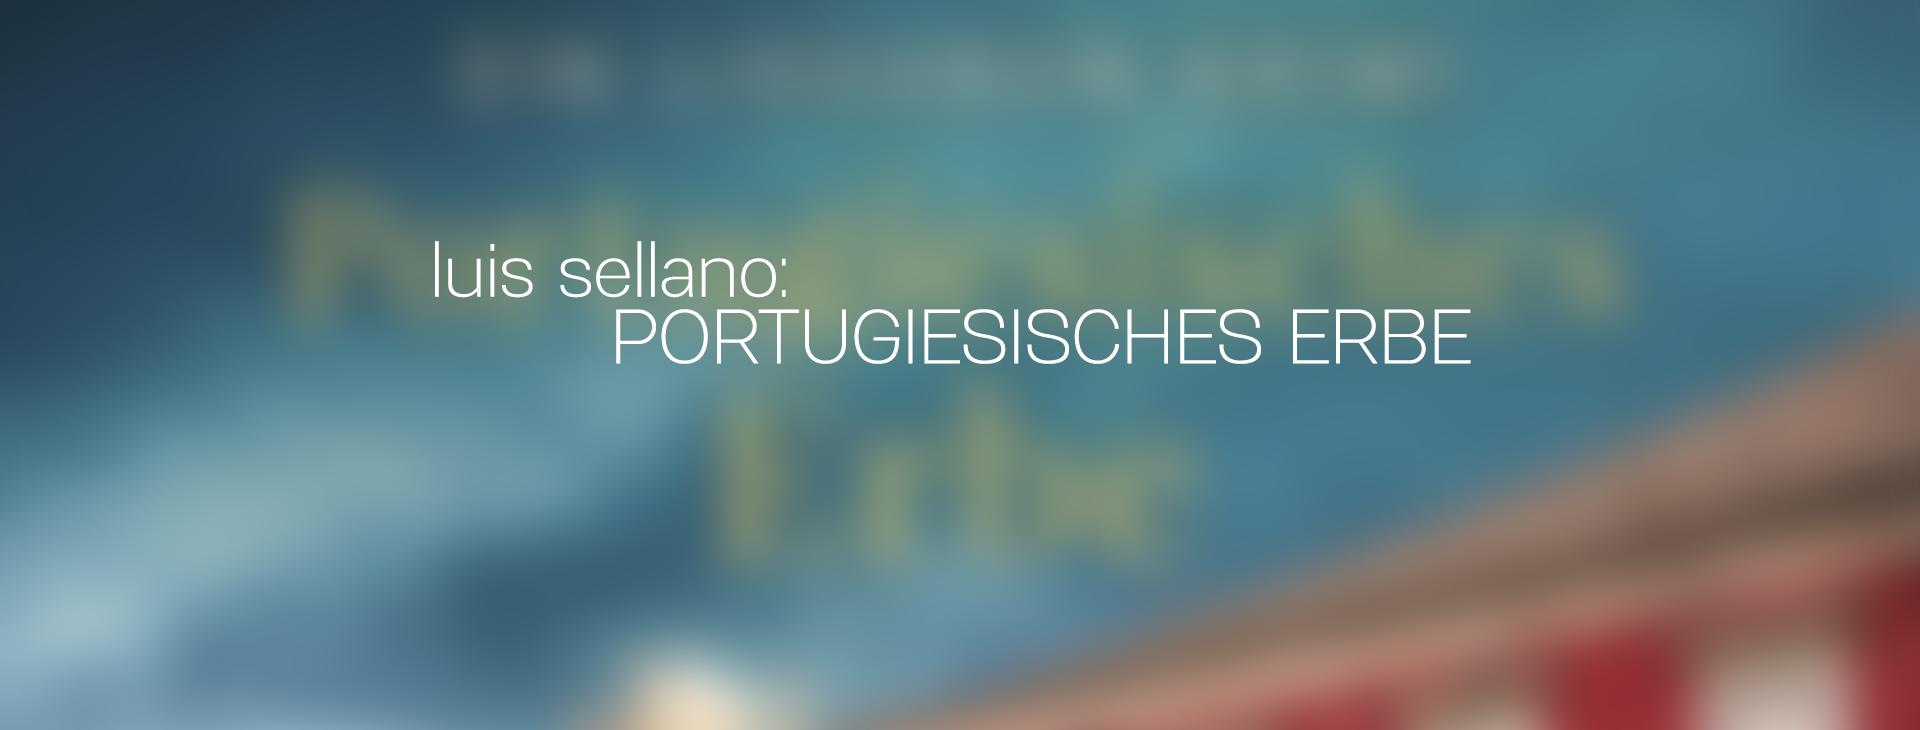 luis sellano portugiesisches erbe_header